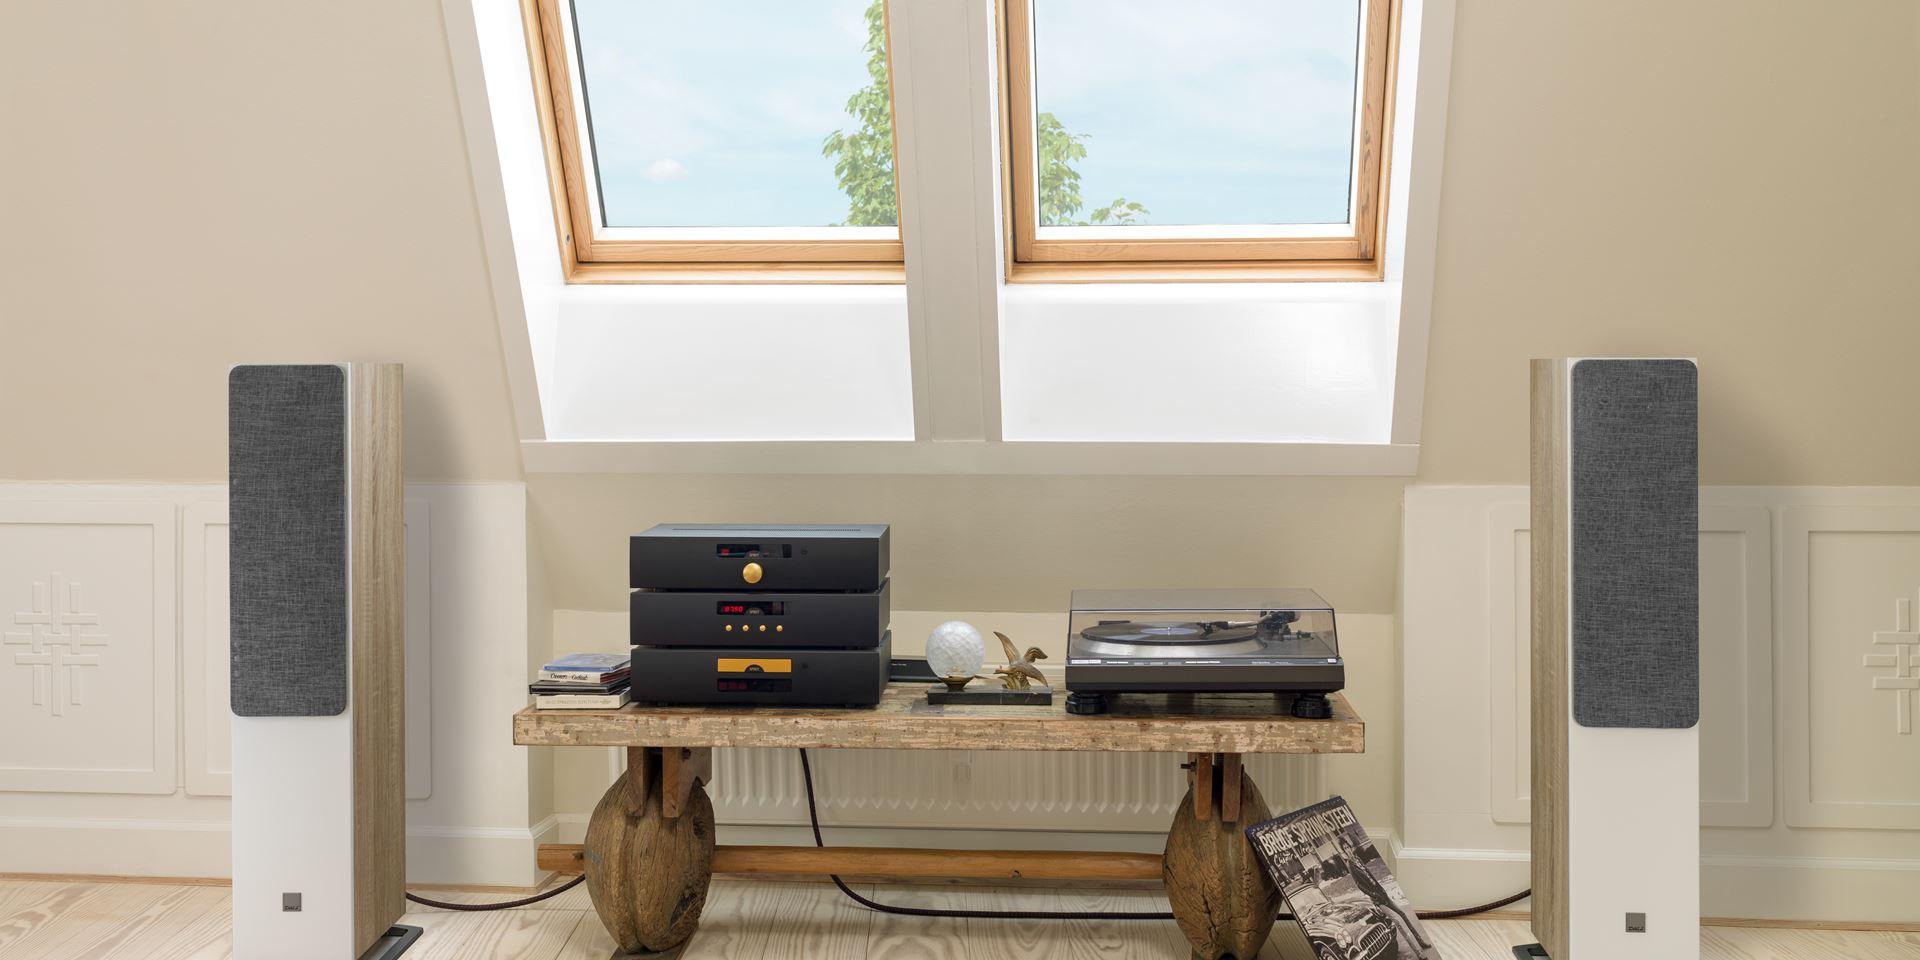 oberon 7 oak grille stereo - 【DENON PMA-800NE】価格を超えたエントリークラスのおすすめアンプ【10万円以下】